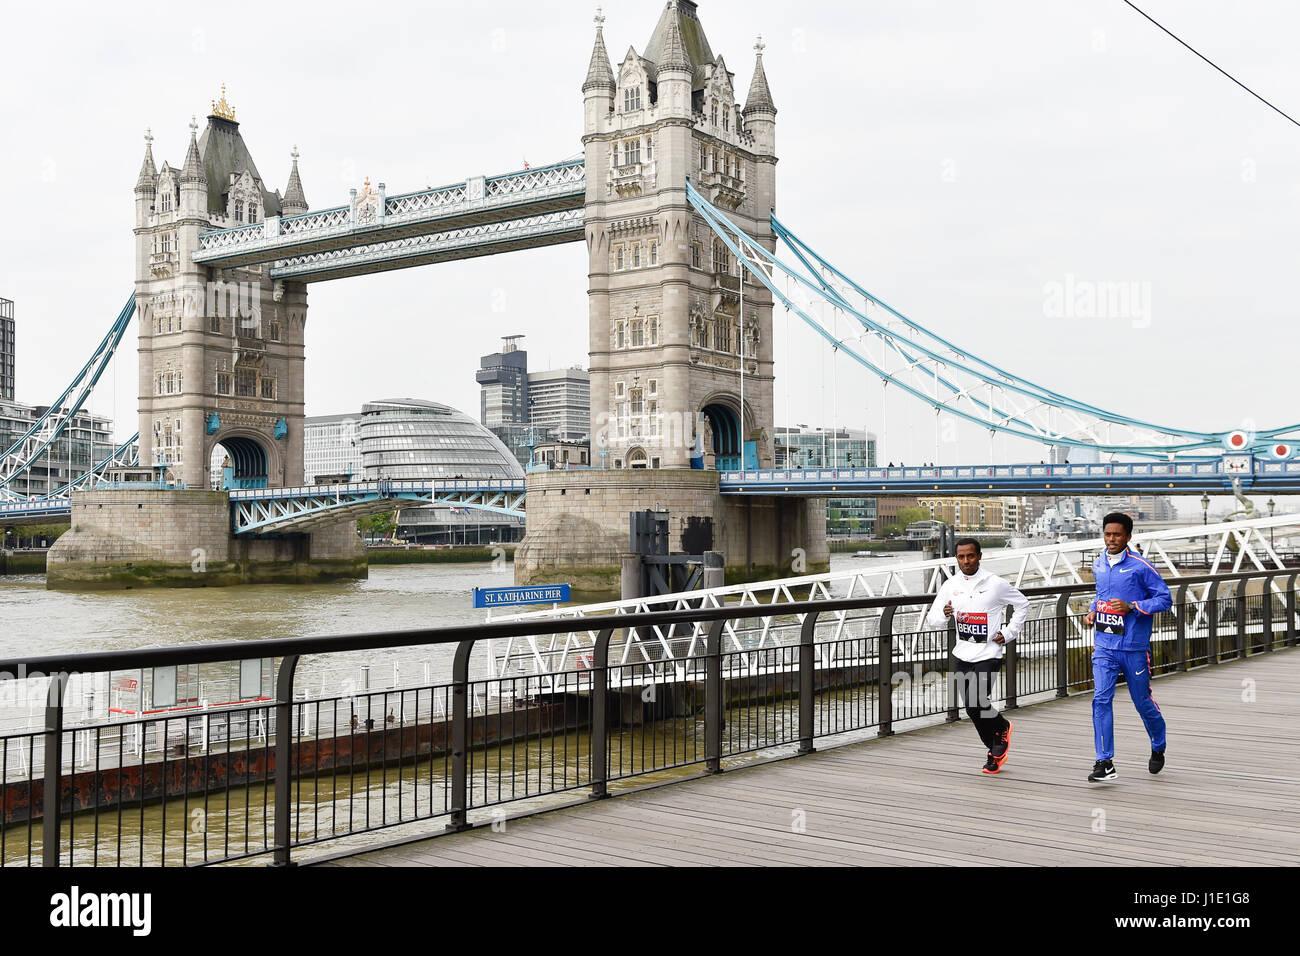 London, UK. 20th Apr, 2017. Kenenisa Bekele, Feyisa Lilesa attend the elite mens photo call for London Marathon - Stock Image